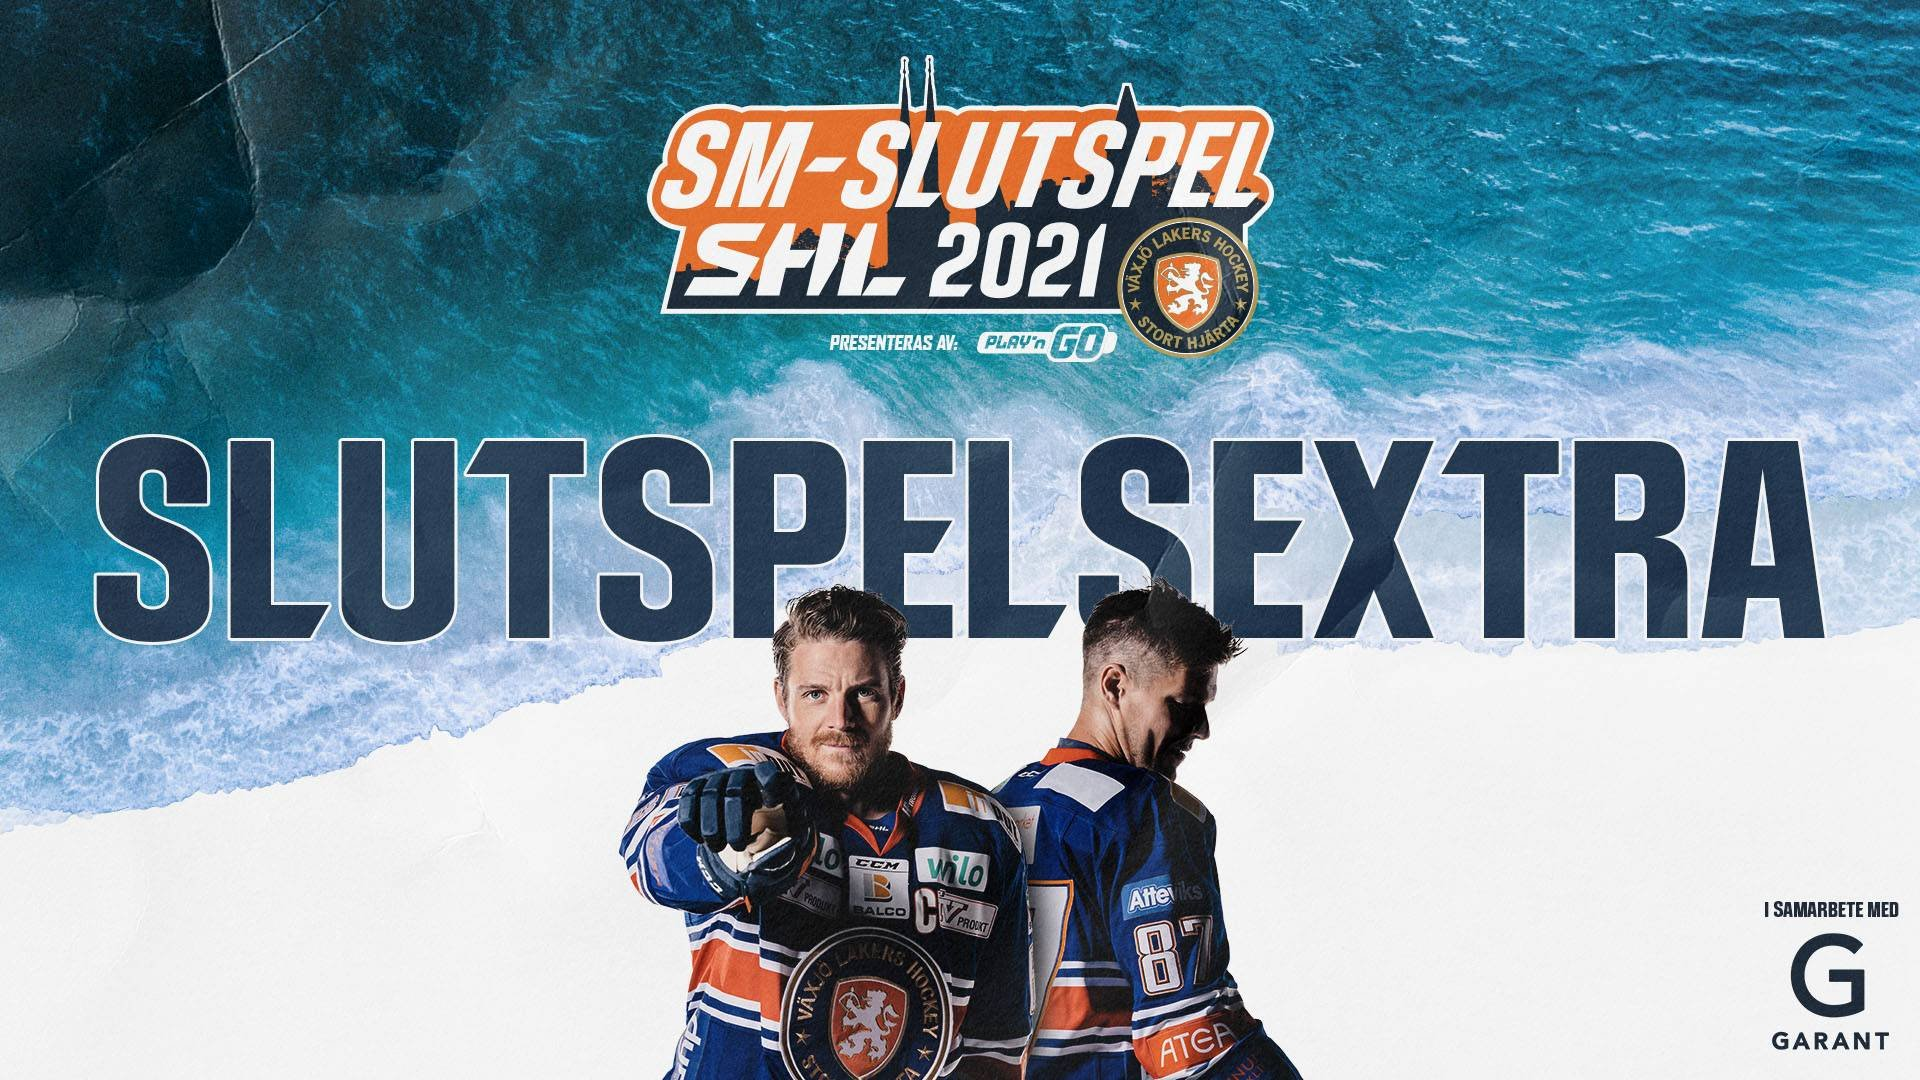 Slutspelsextra med Erik Josefsson & Robert Rosén